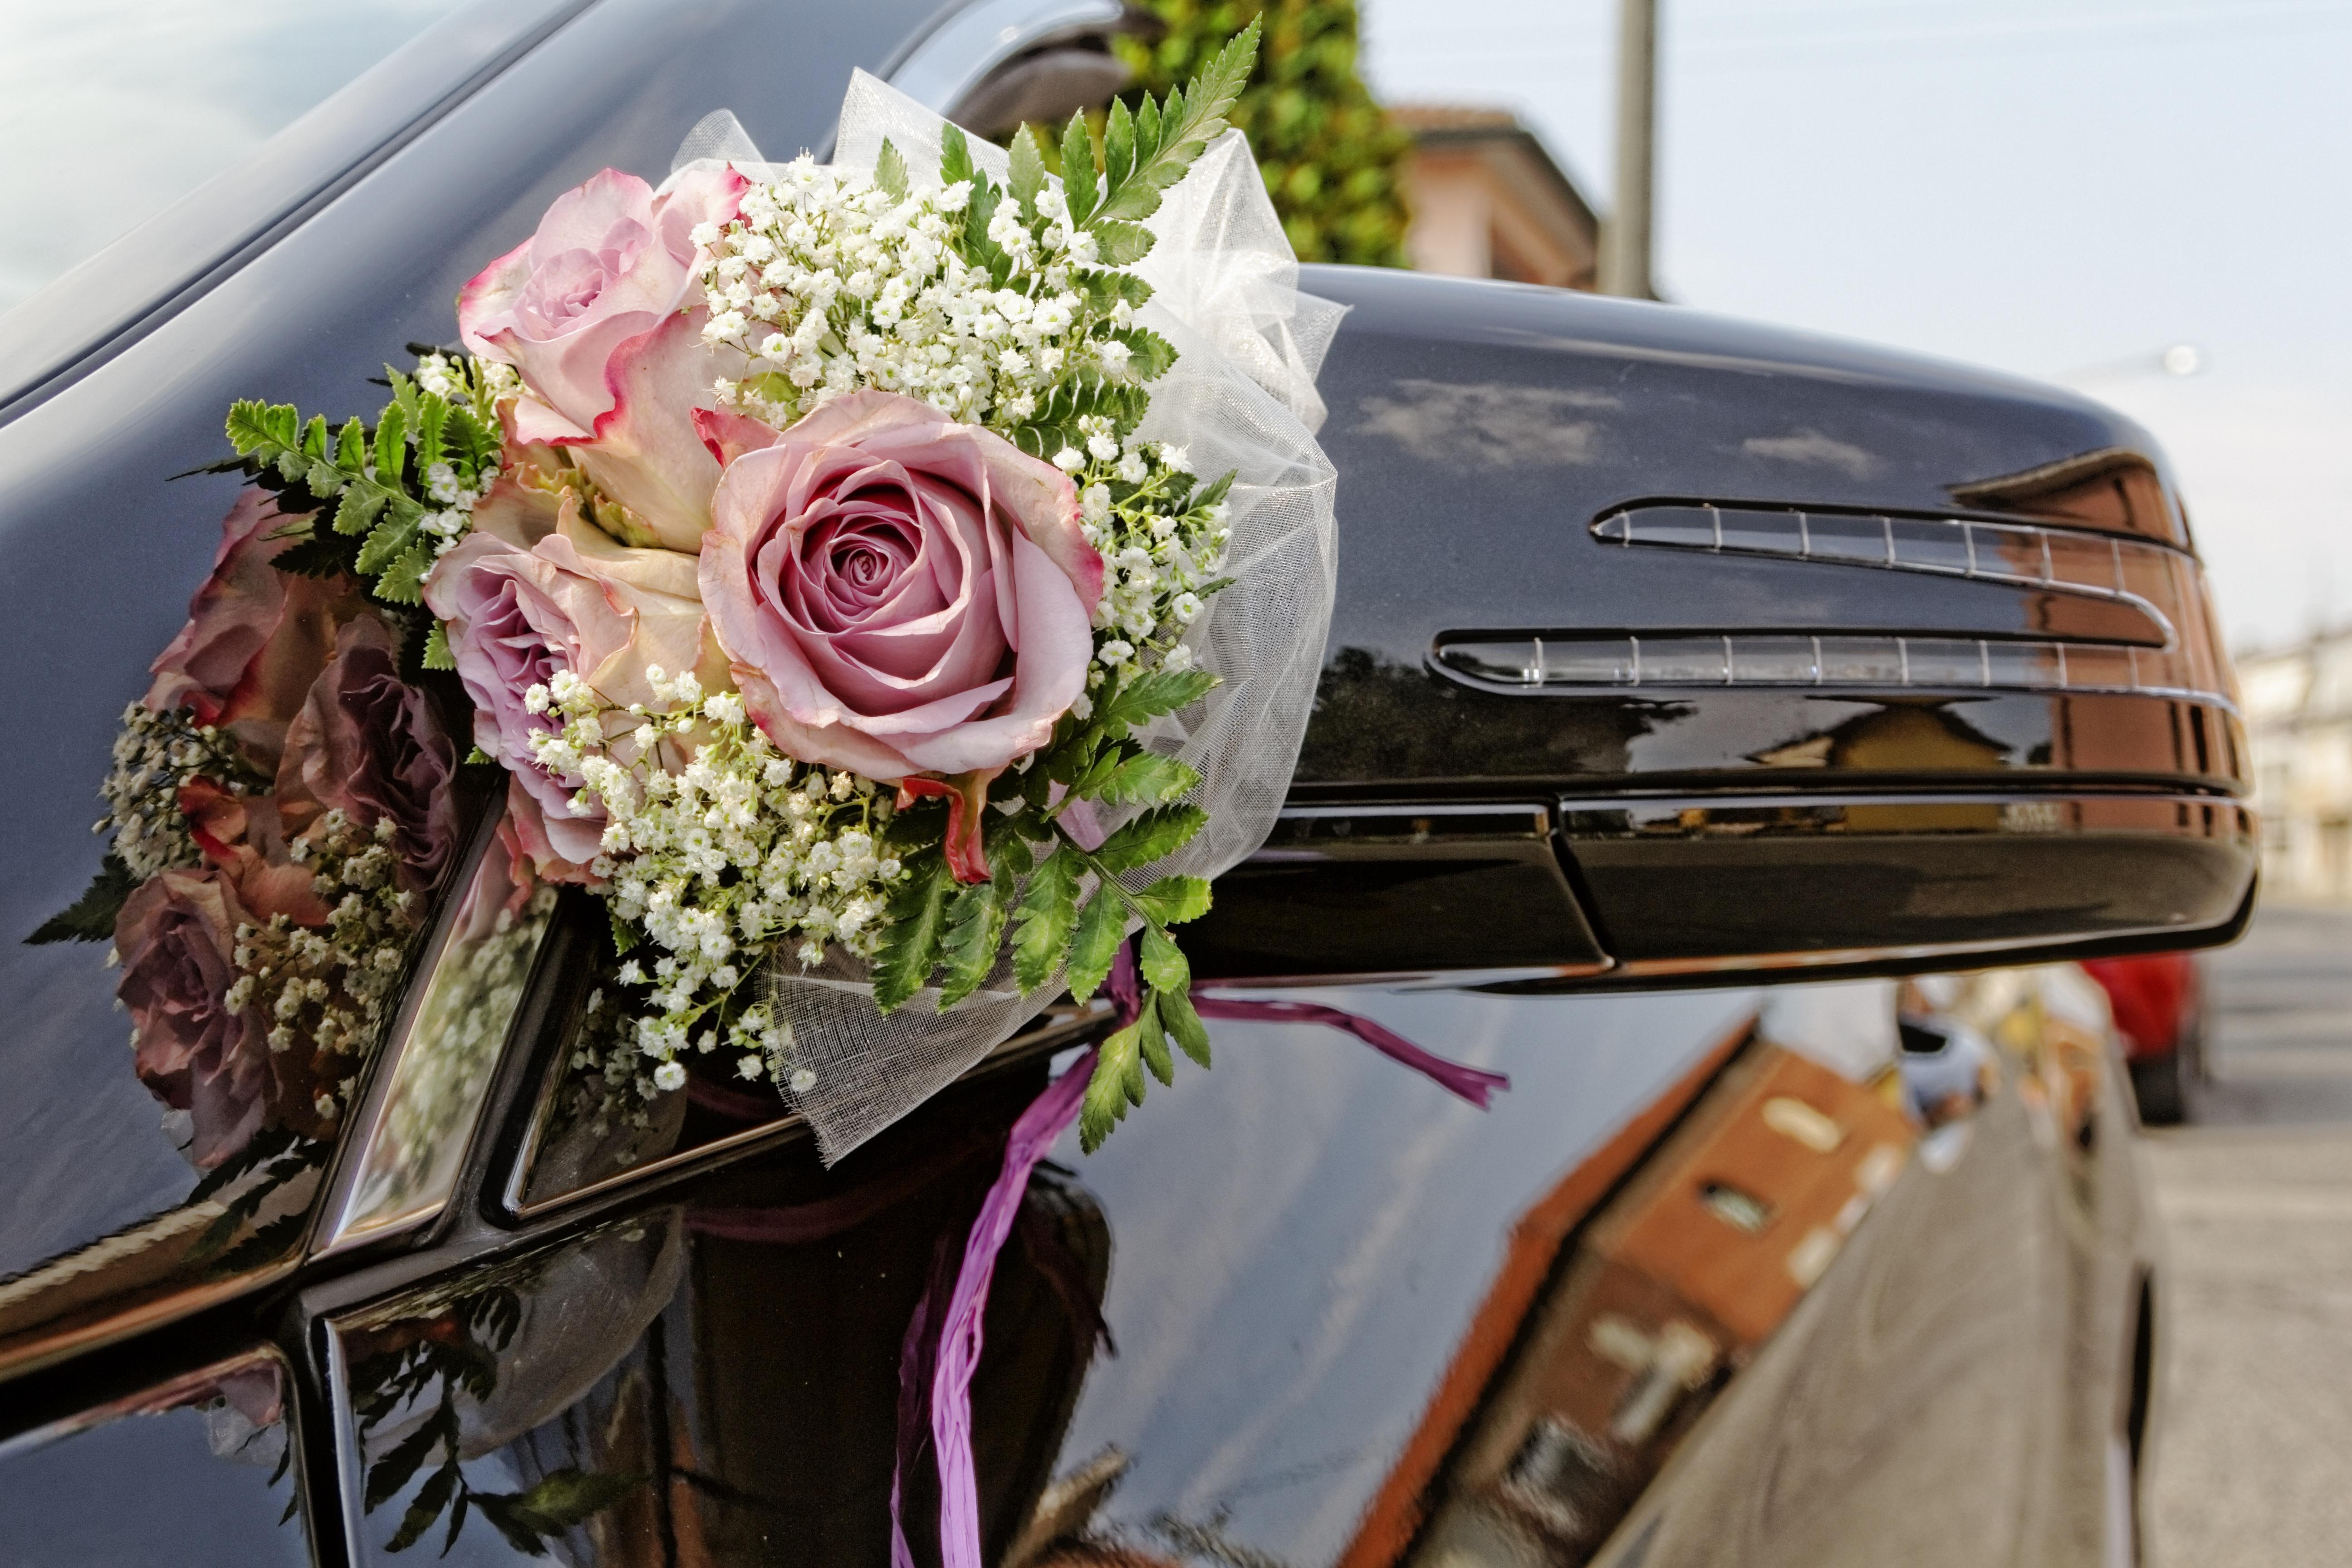 Free Images Rose Decoration Romance Auto Bride Marriage